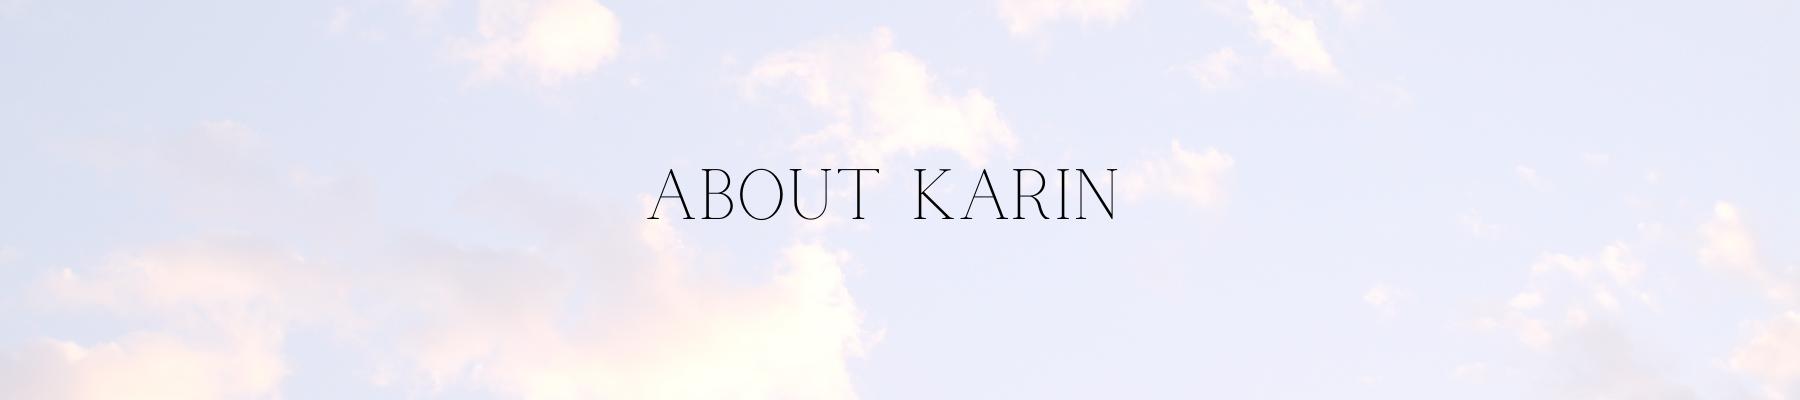 About Karin, karin brauner, karinbrauneronline, guatemalan, blogger, writer, entrepreneur, counsellor, supervisor, coach, workshop presenter, course and content creator Karin Brauner Online - Get life and Business (back) On Track